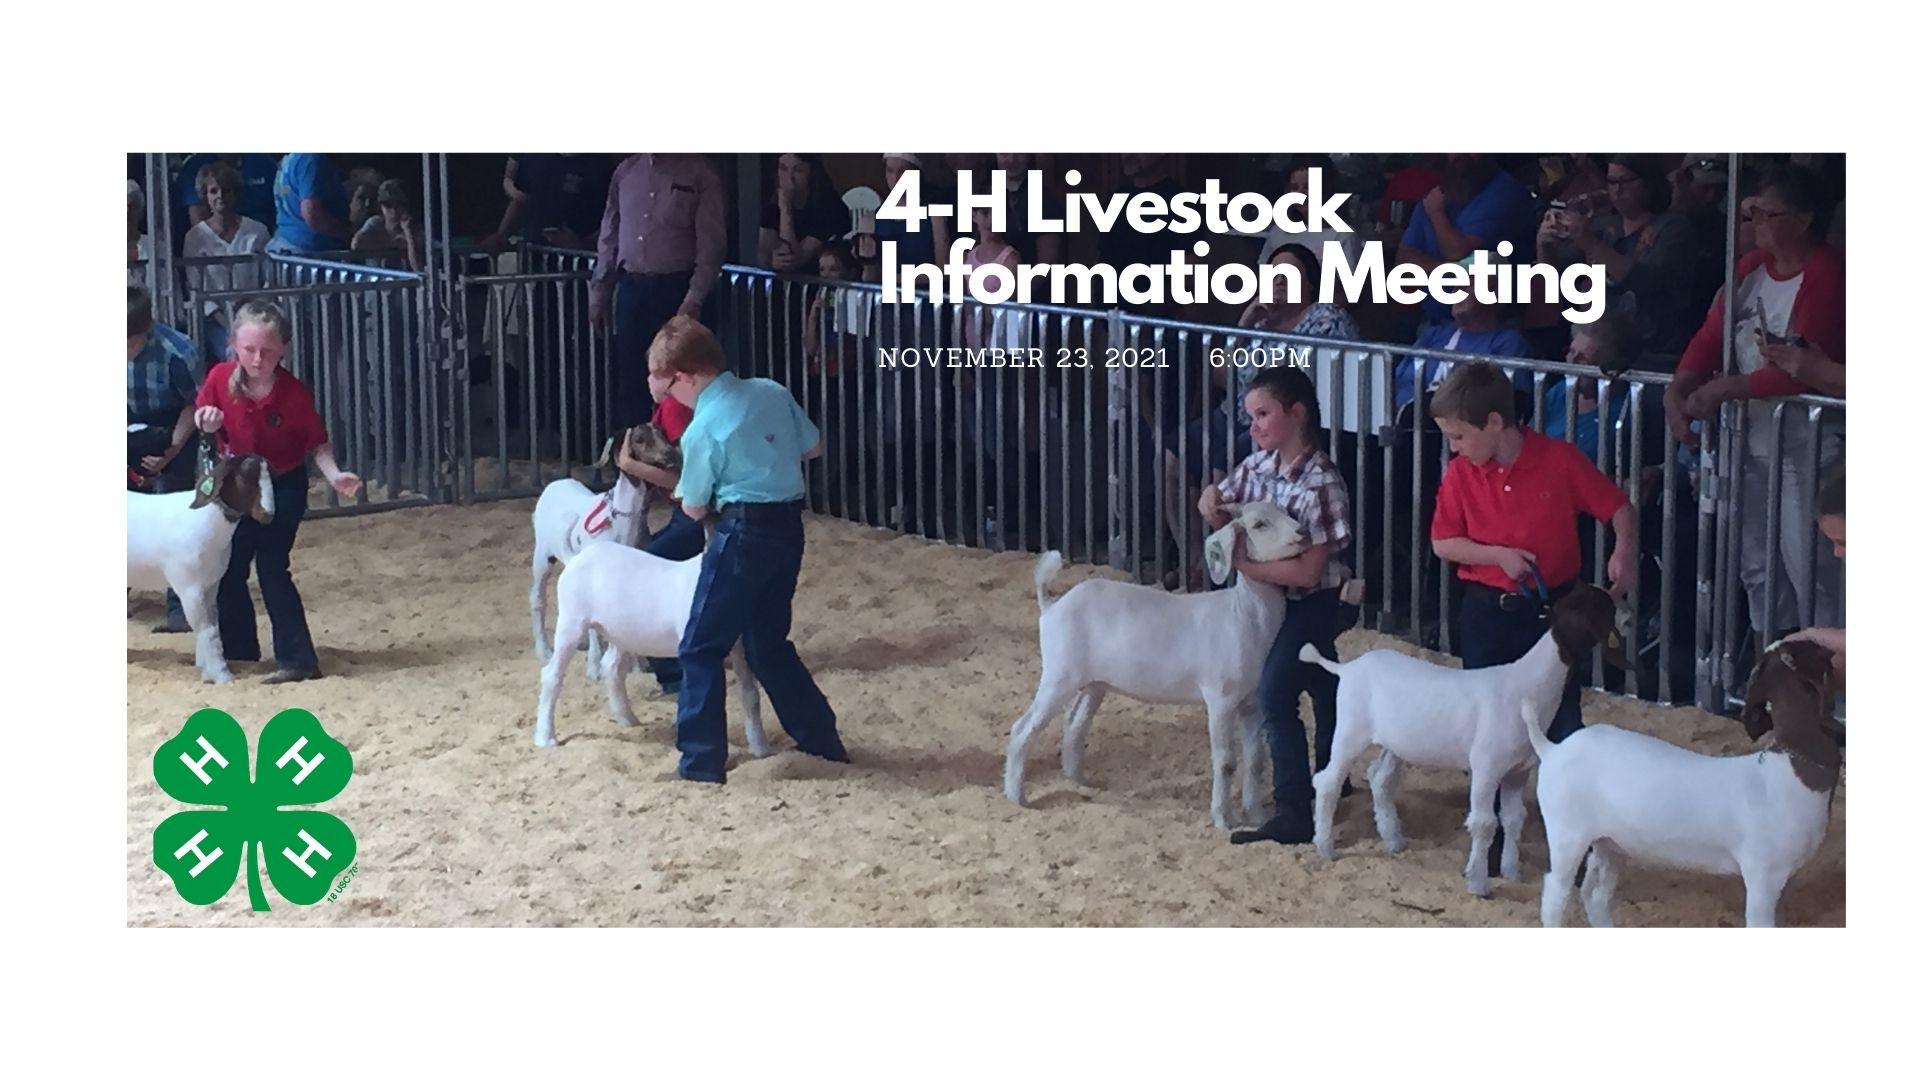 4-H Livestock Informational Meeting